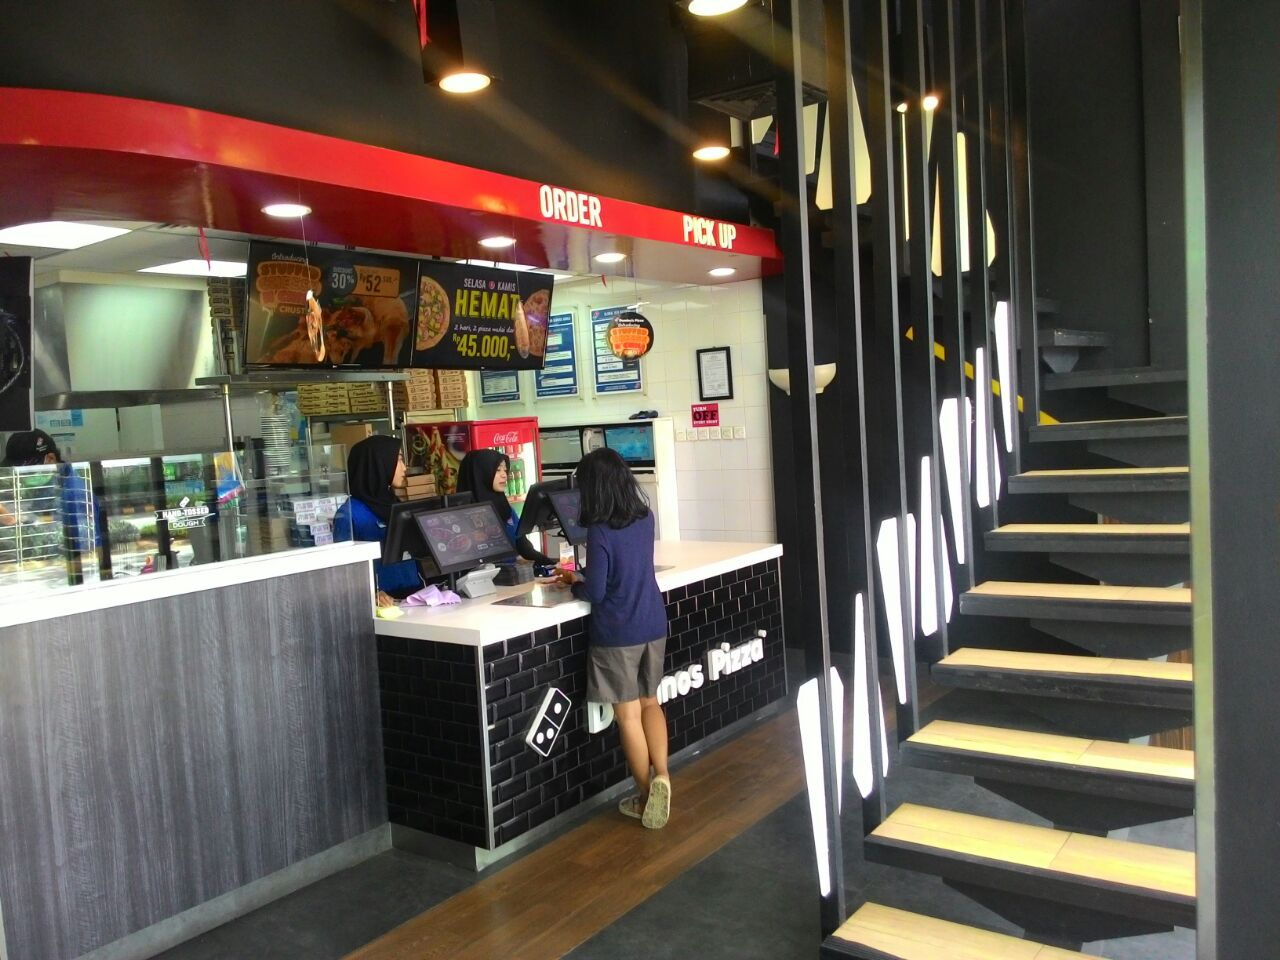 Domino's Pizza - Mustika Jaya, Bekasi